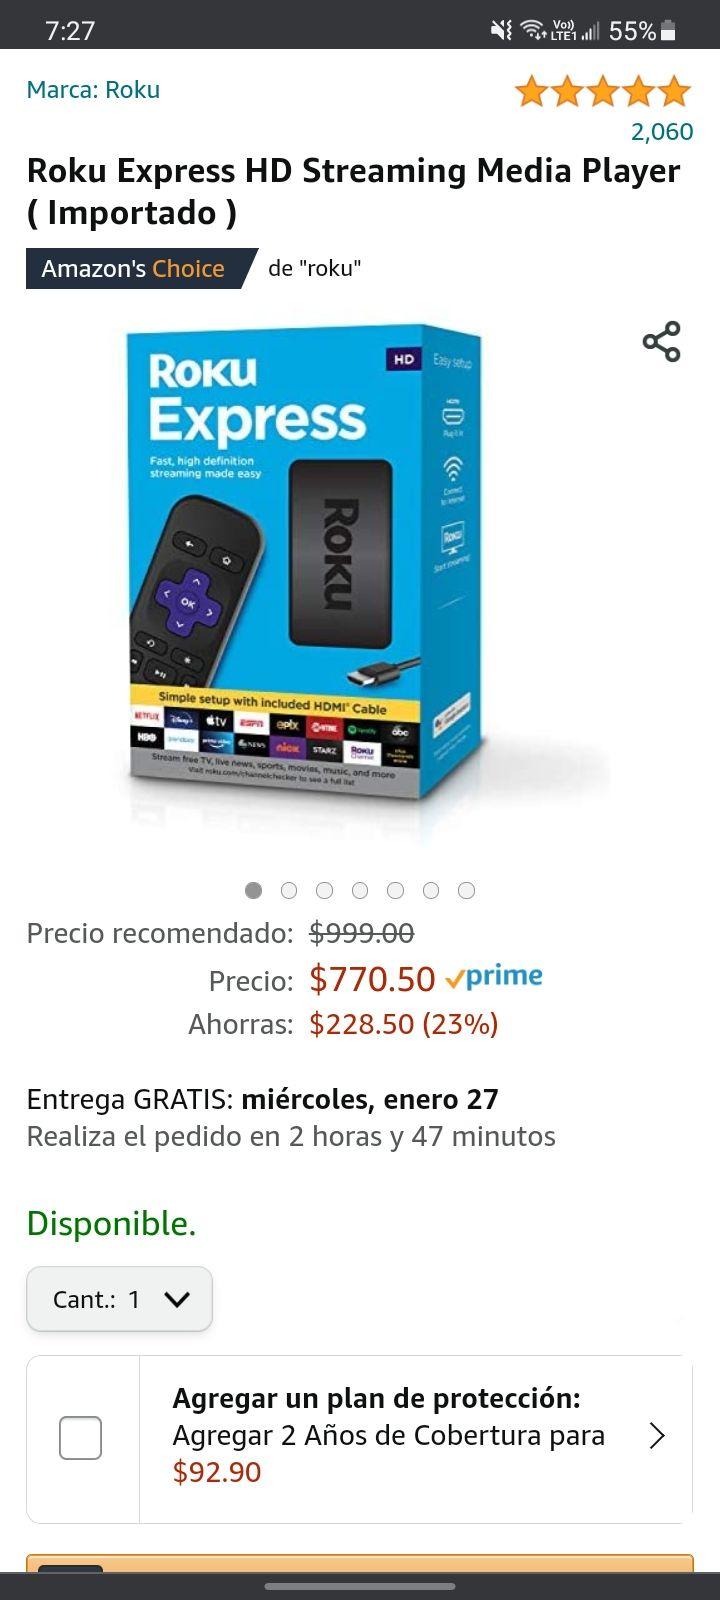 Amazon, Roku Express HD Streaming Media Player